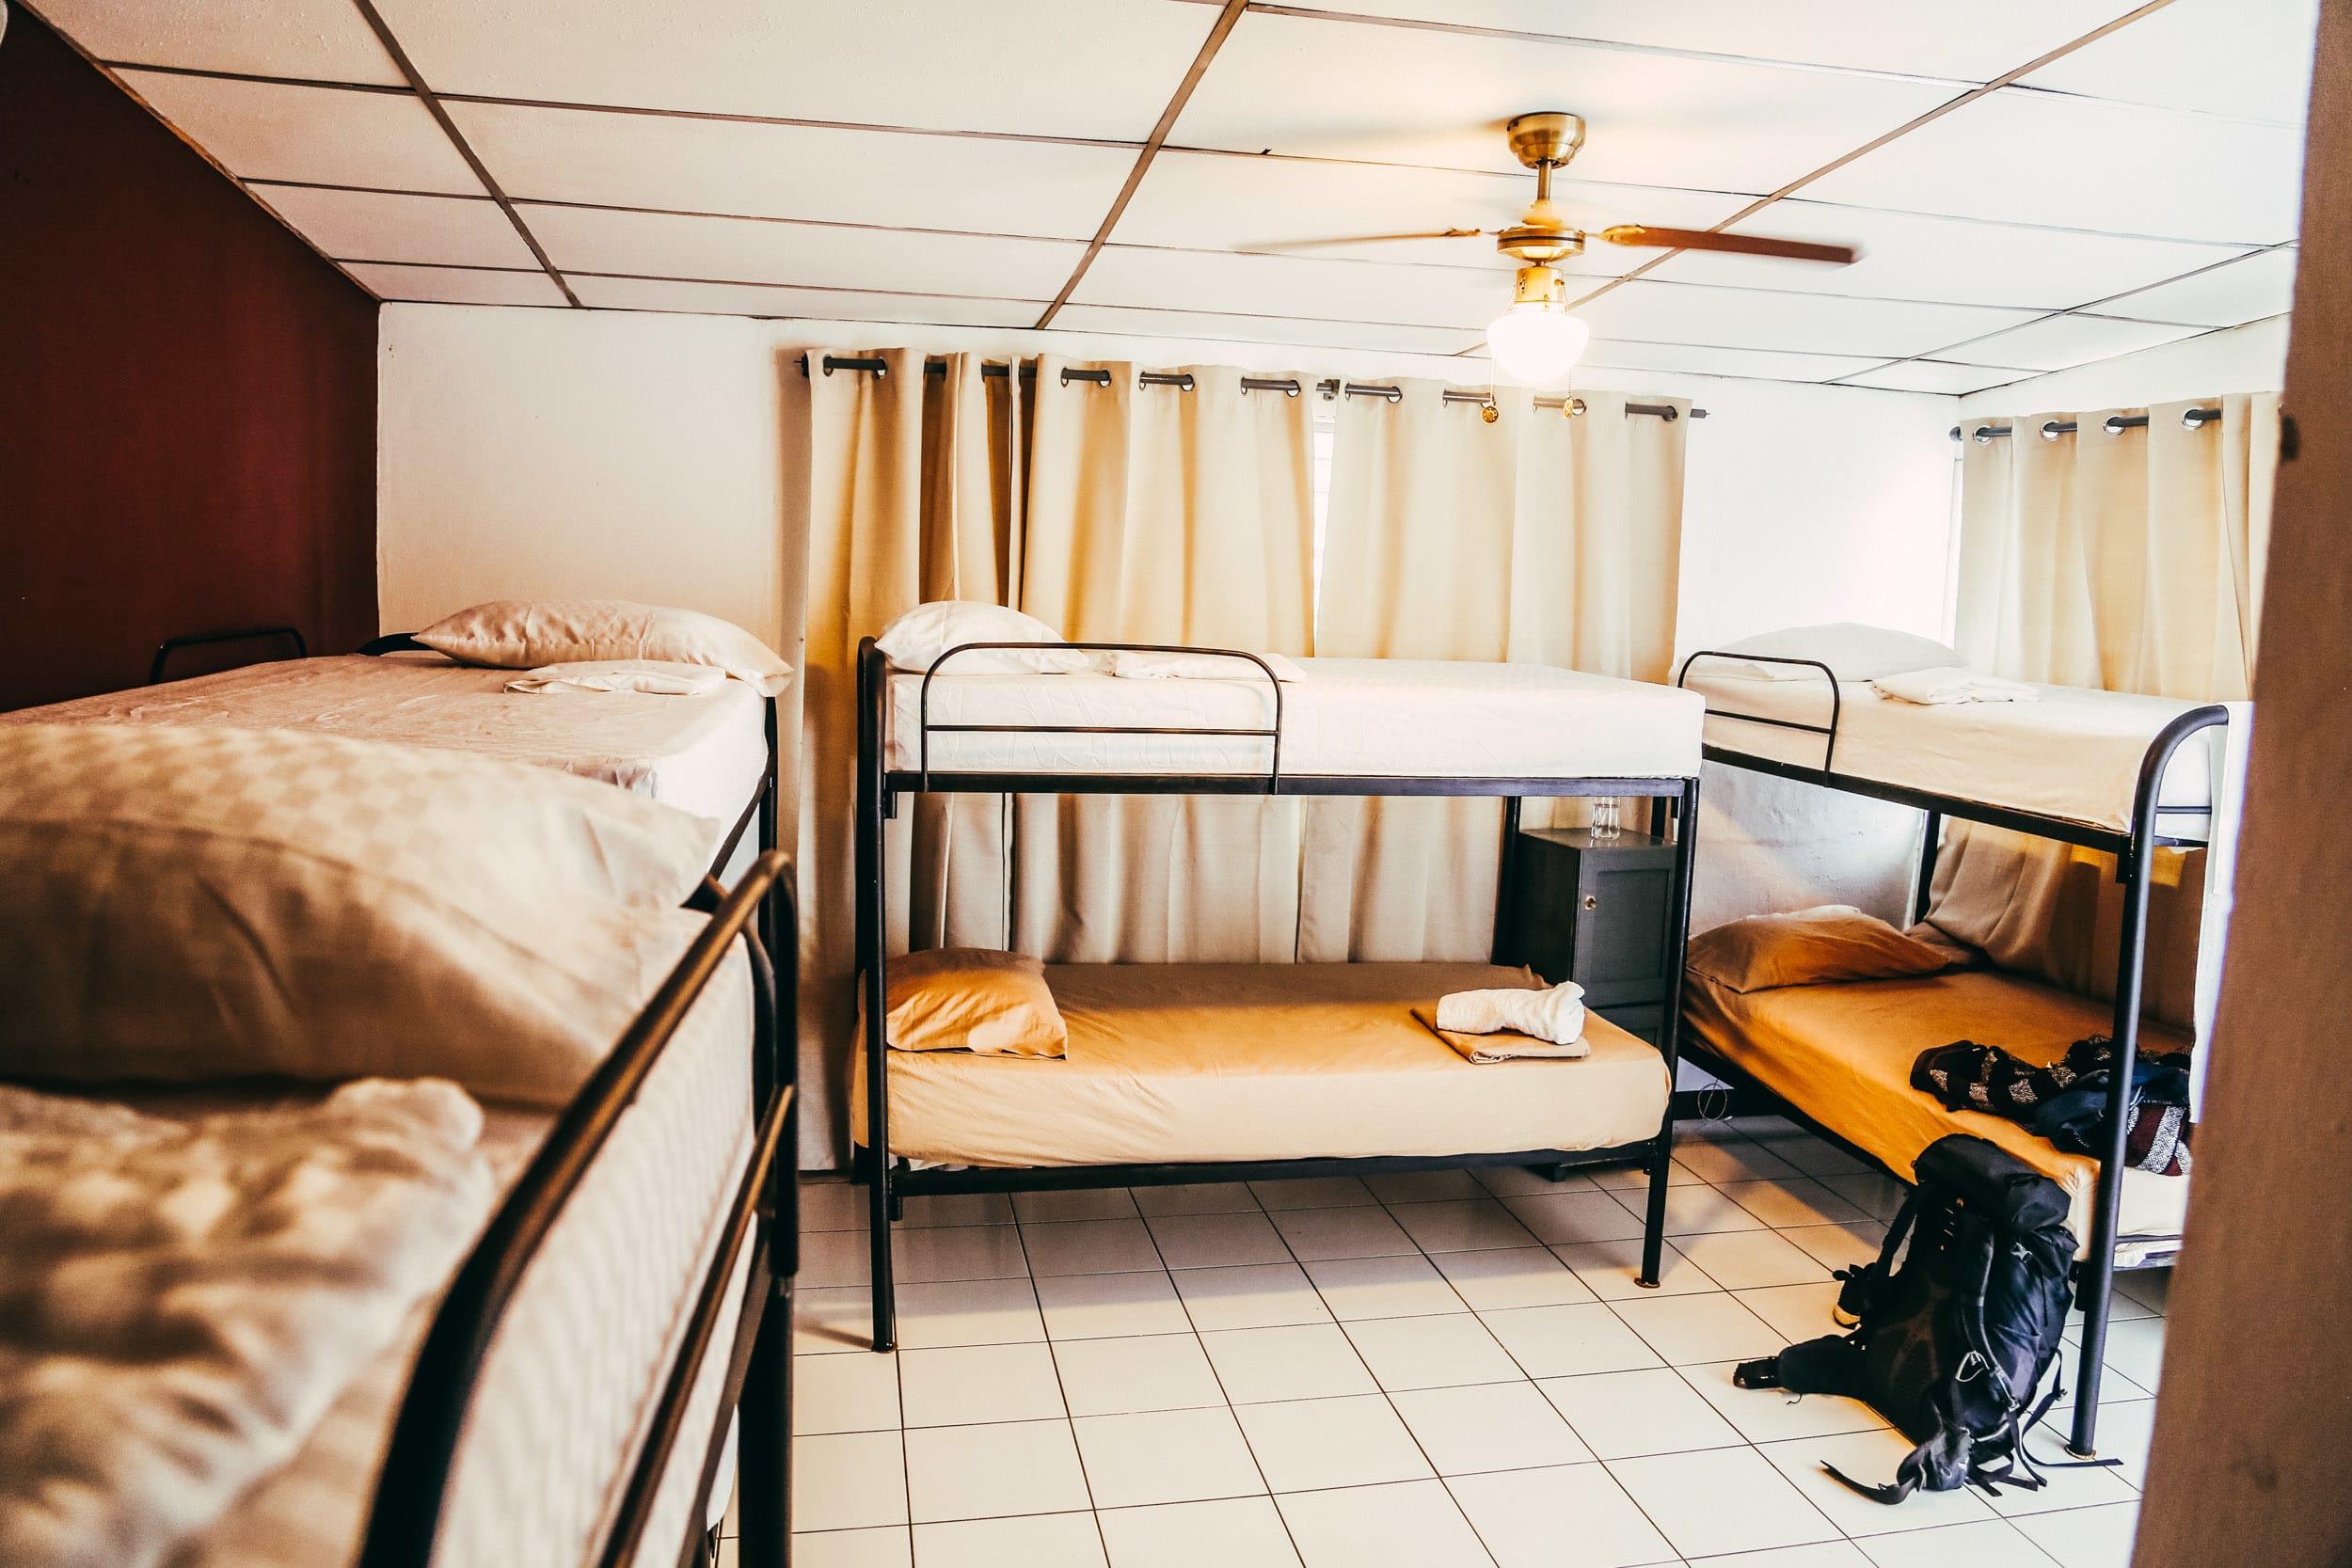 HOSTEL - Manyaku Hostel